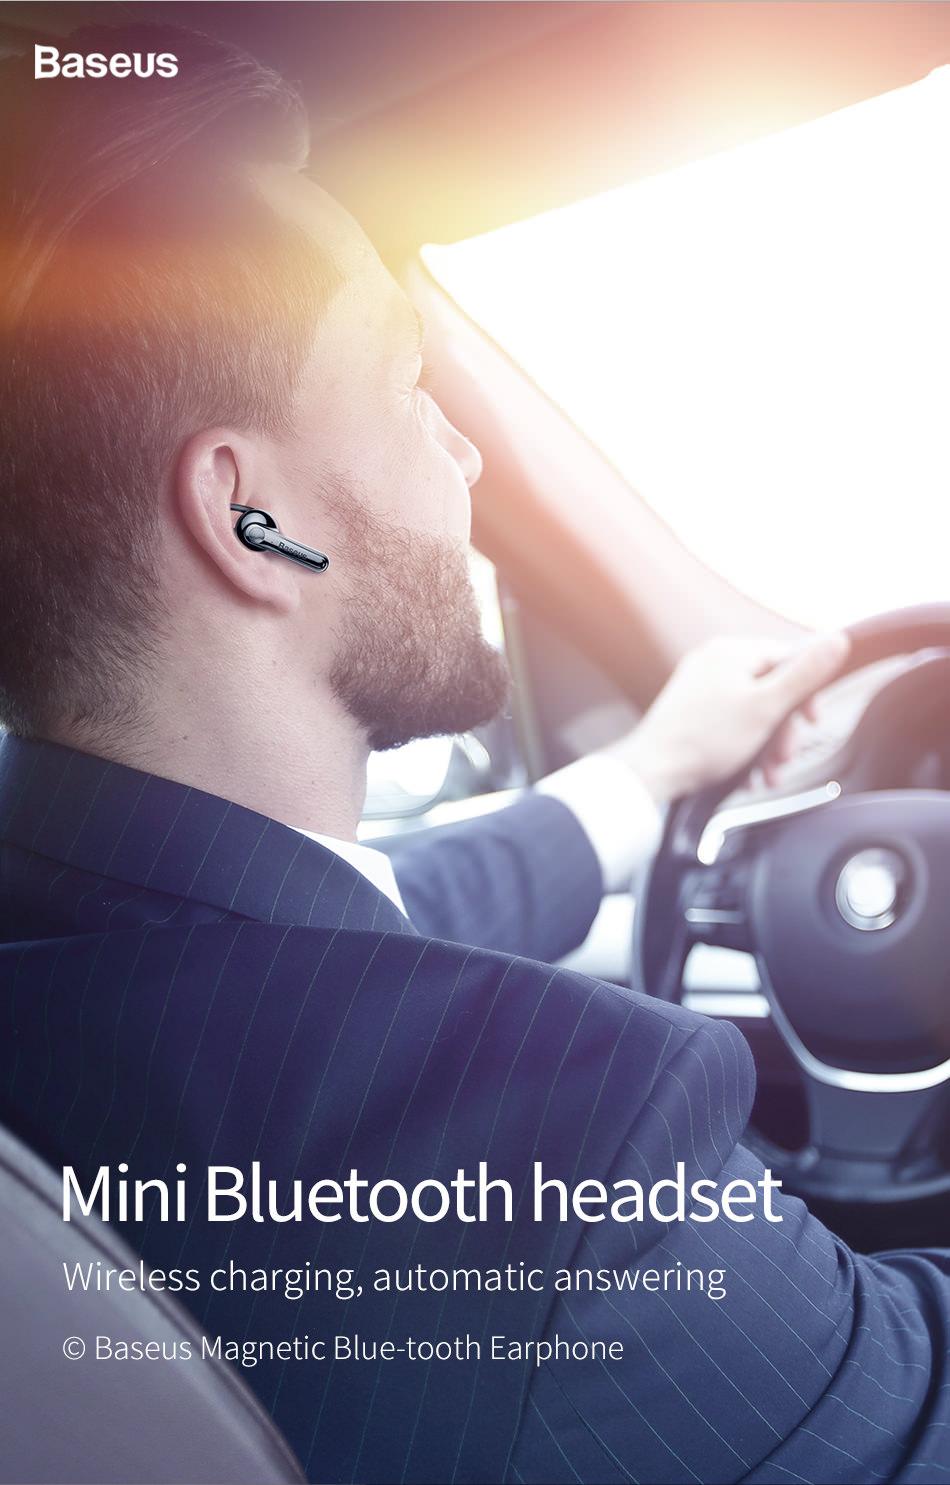 baseus mini bluetooth earphone